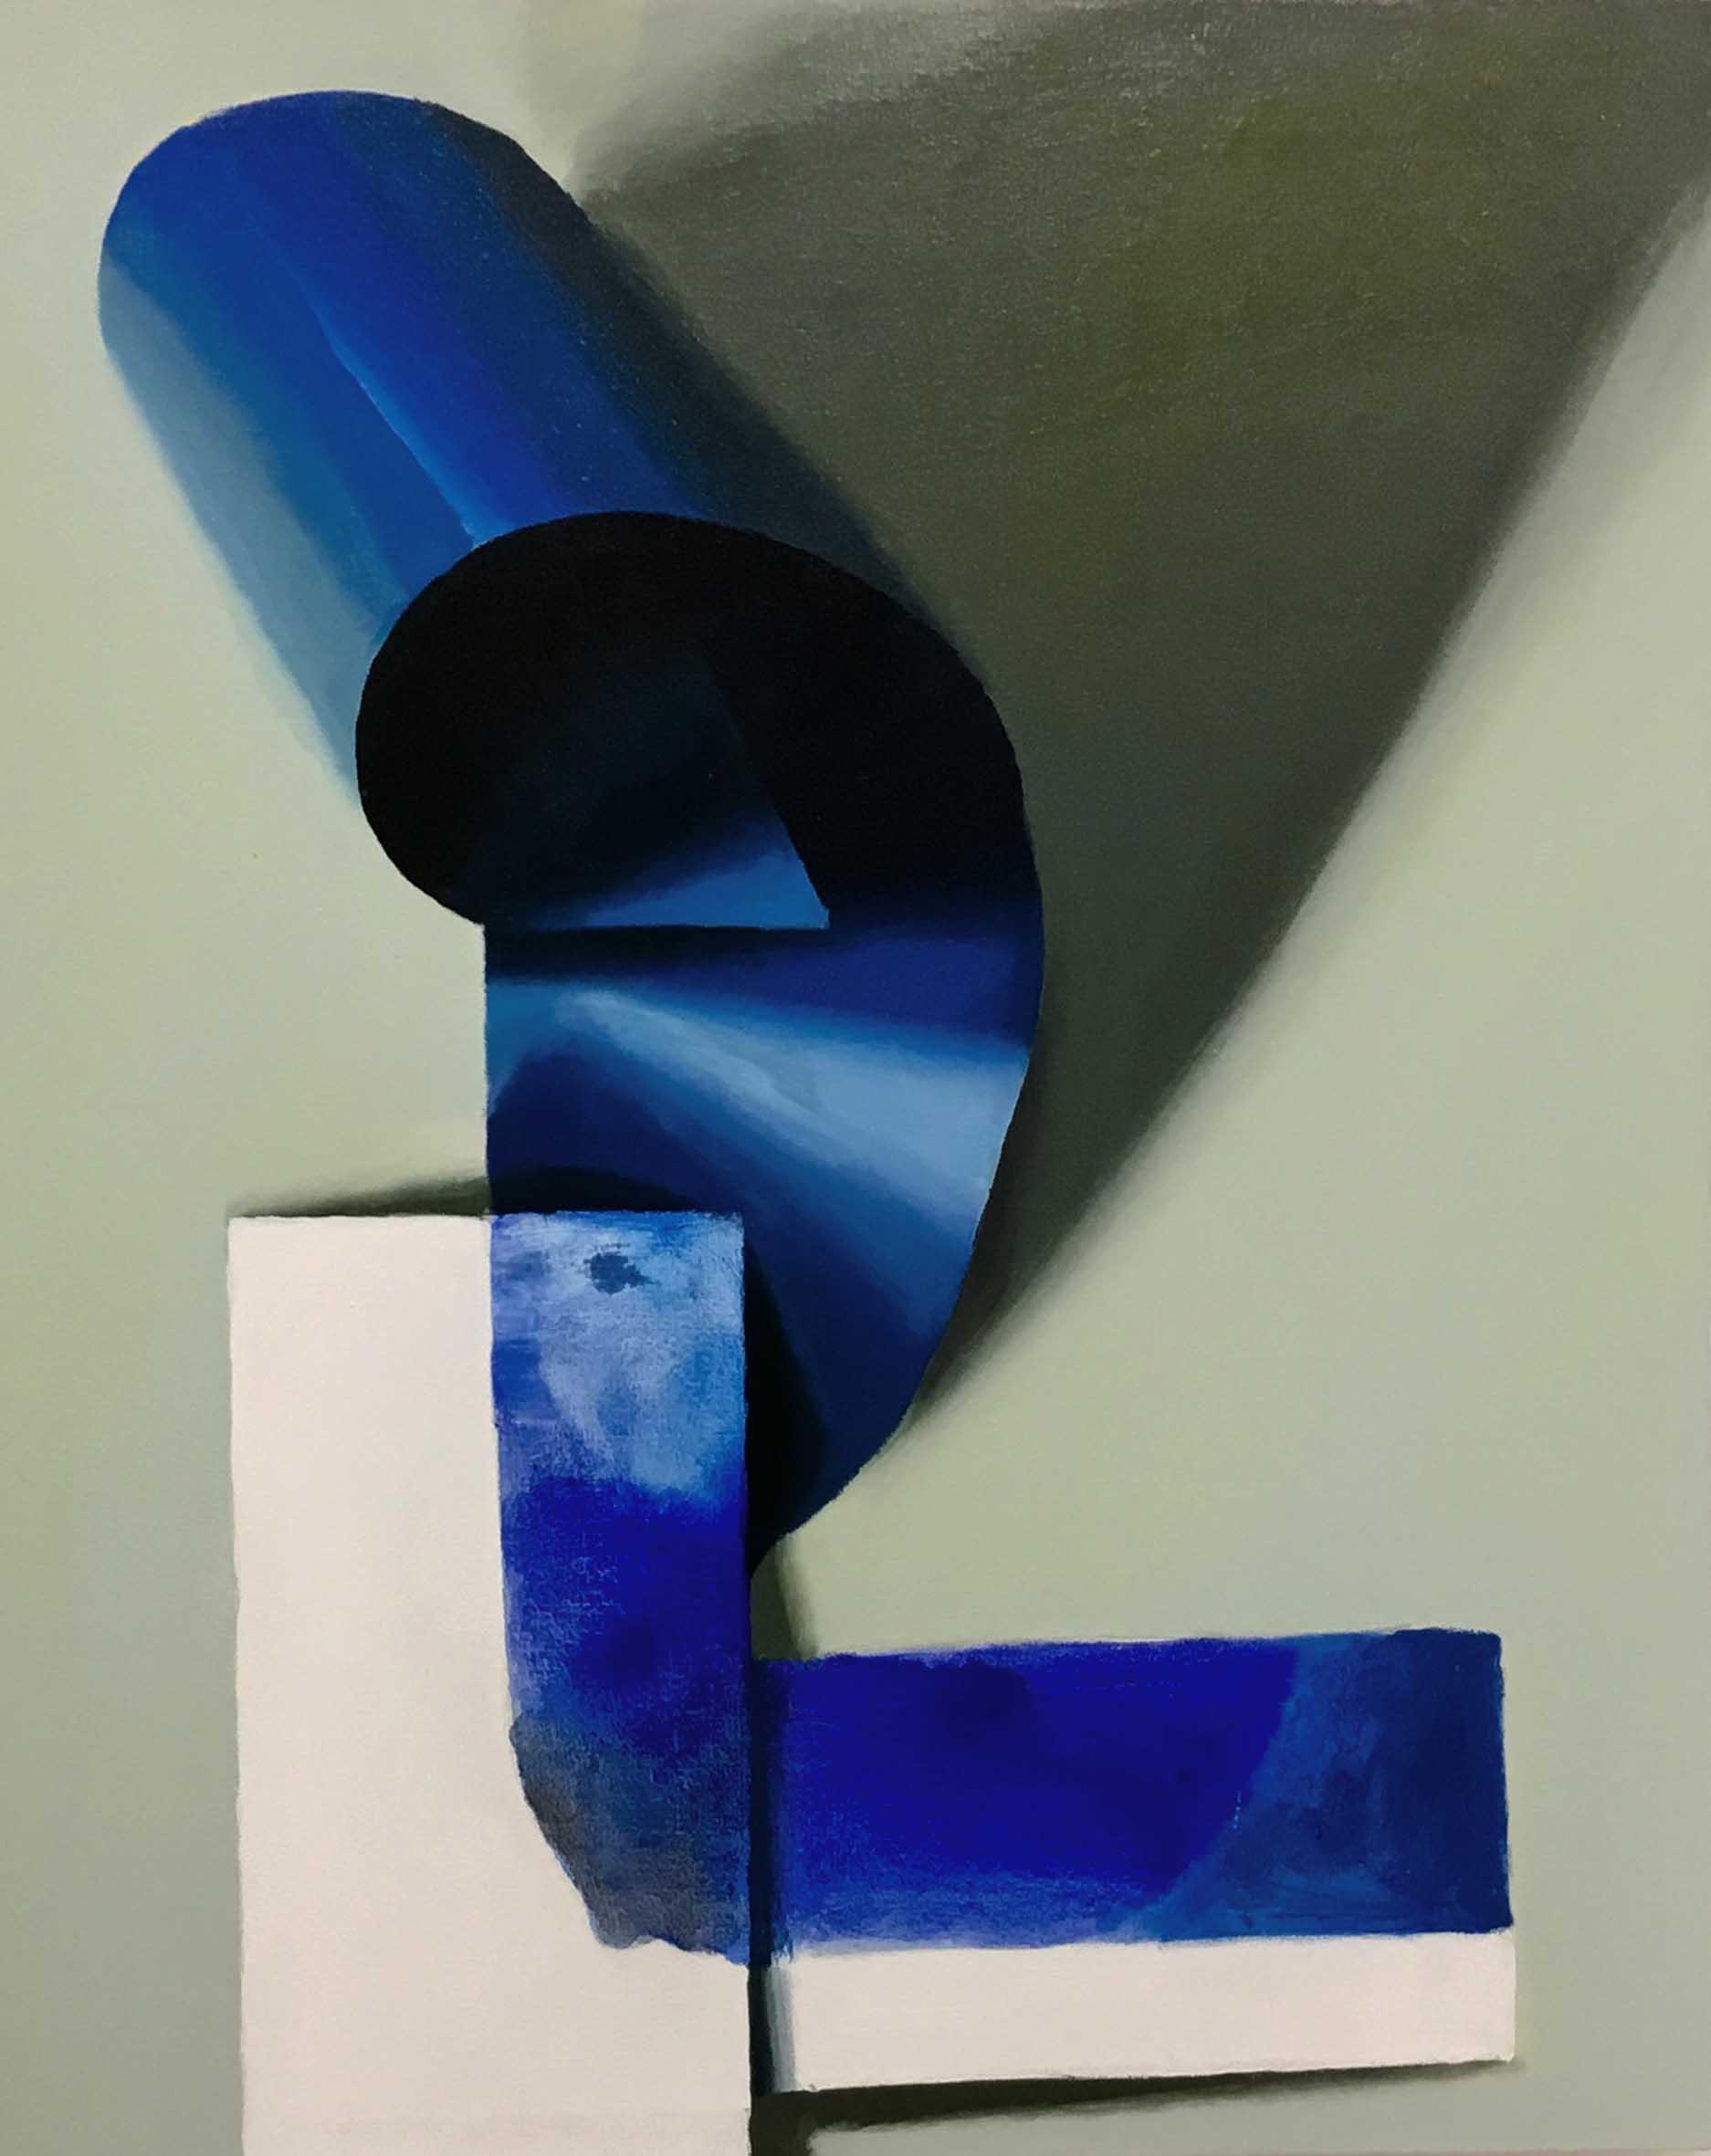 06 L LETRA CAPITAL 92 x 73 cm Pigmento y latex sobre loneta 2017